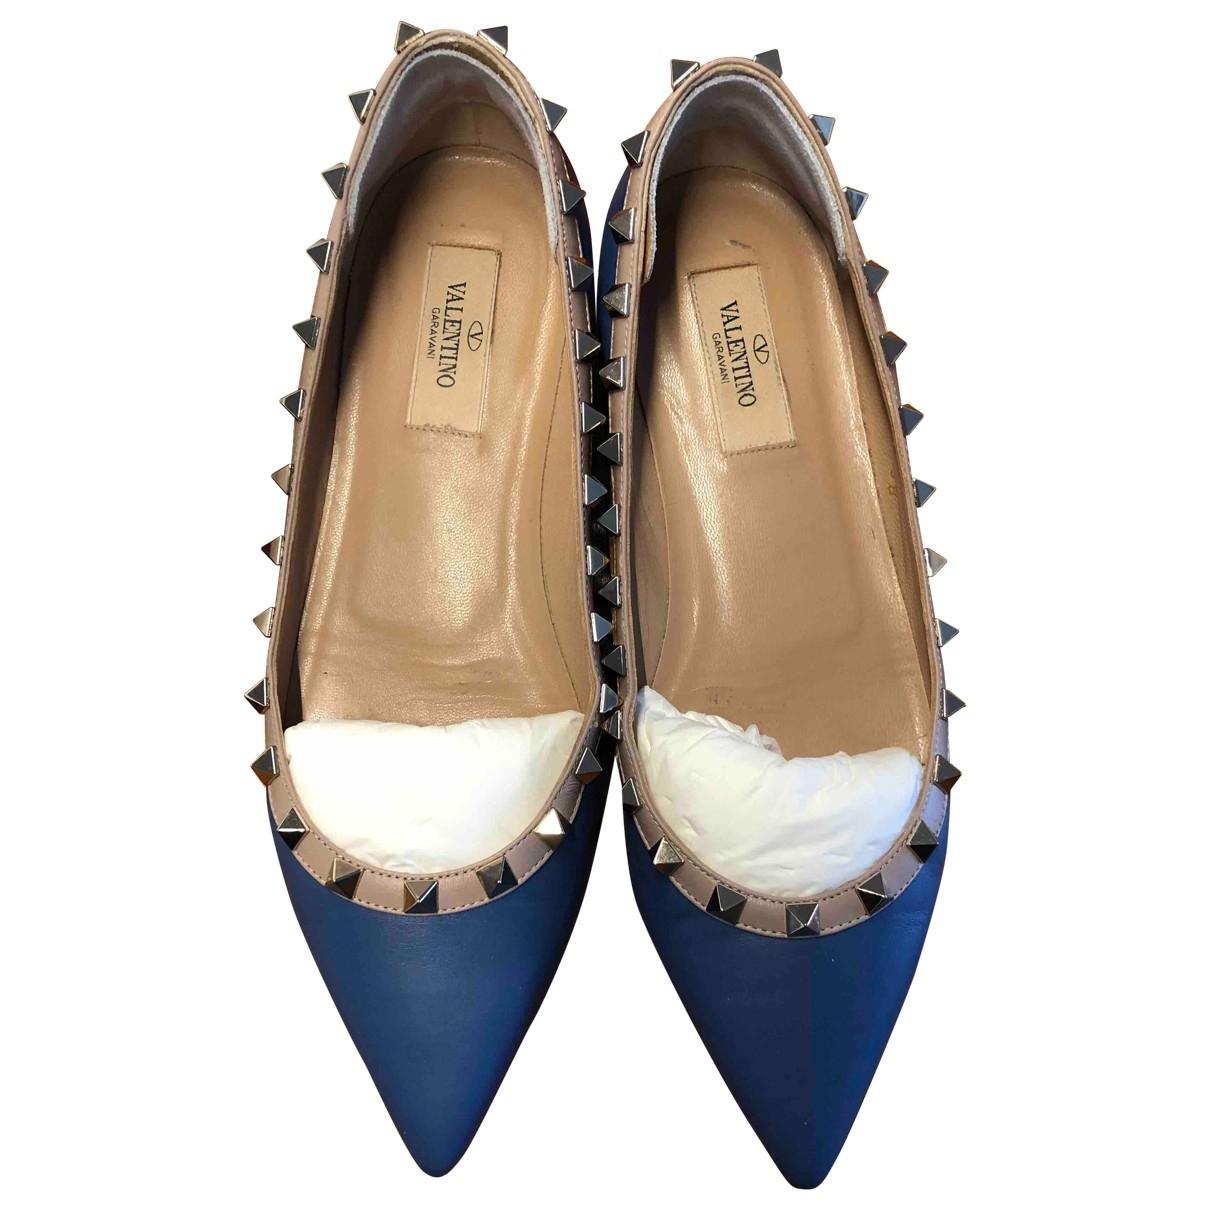 Valentino Garavani - Ballerines Rockstud pour femme en cuir - bleu